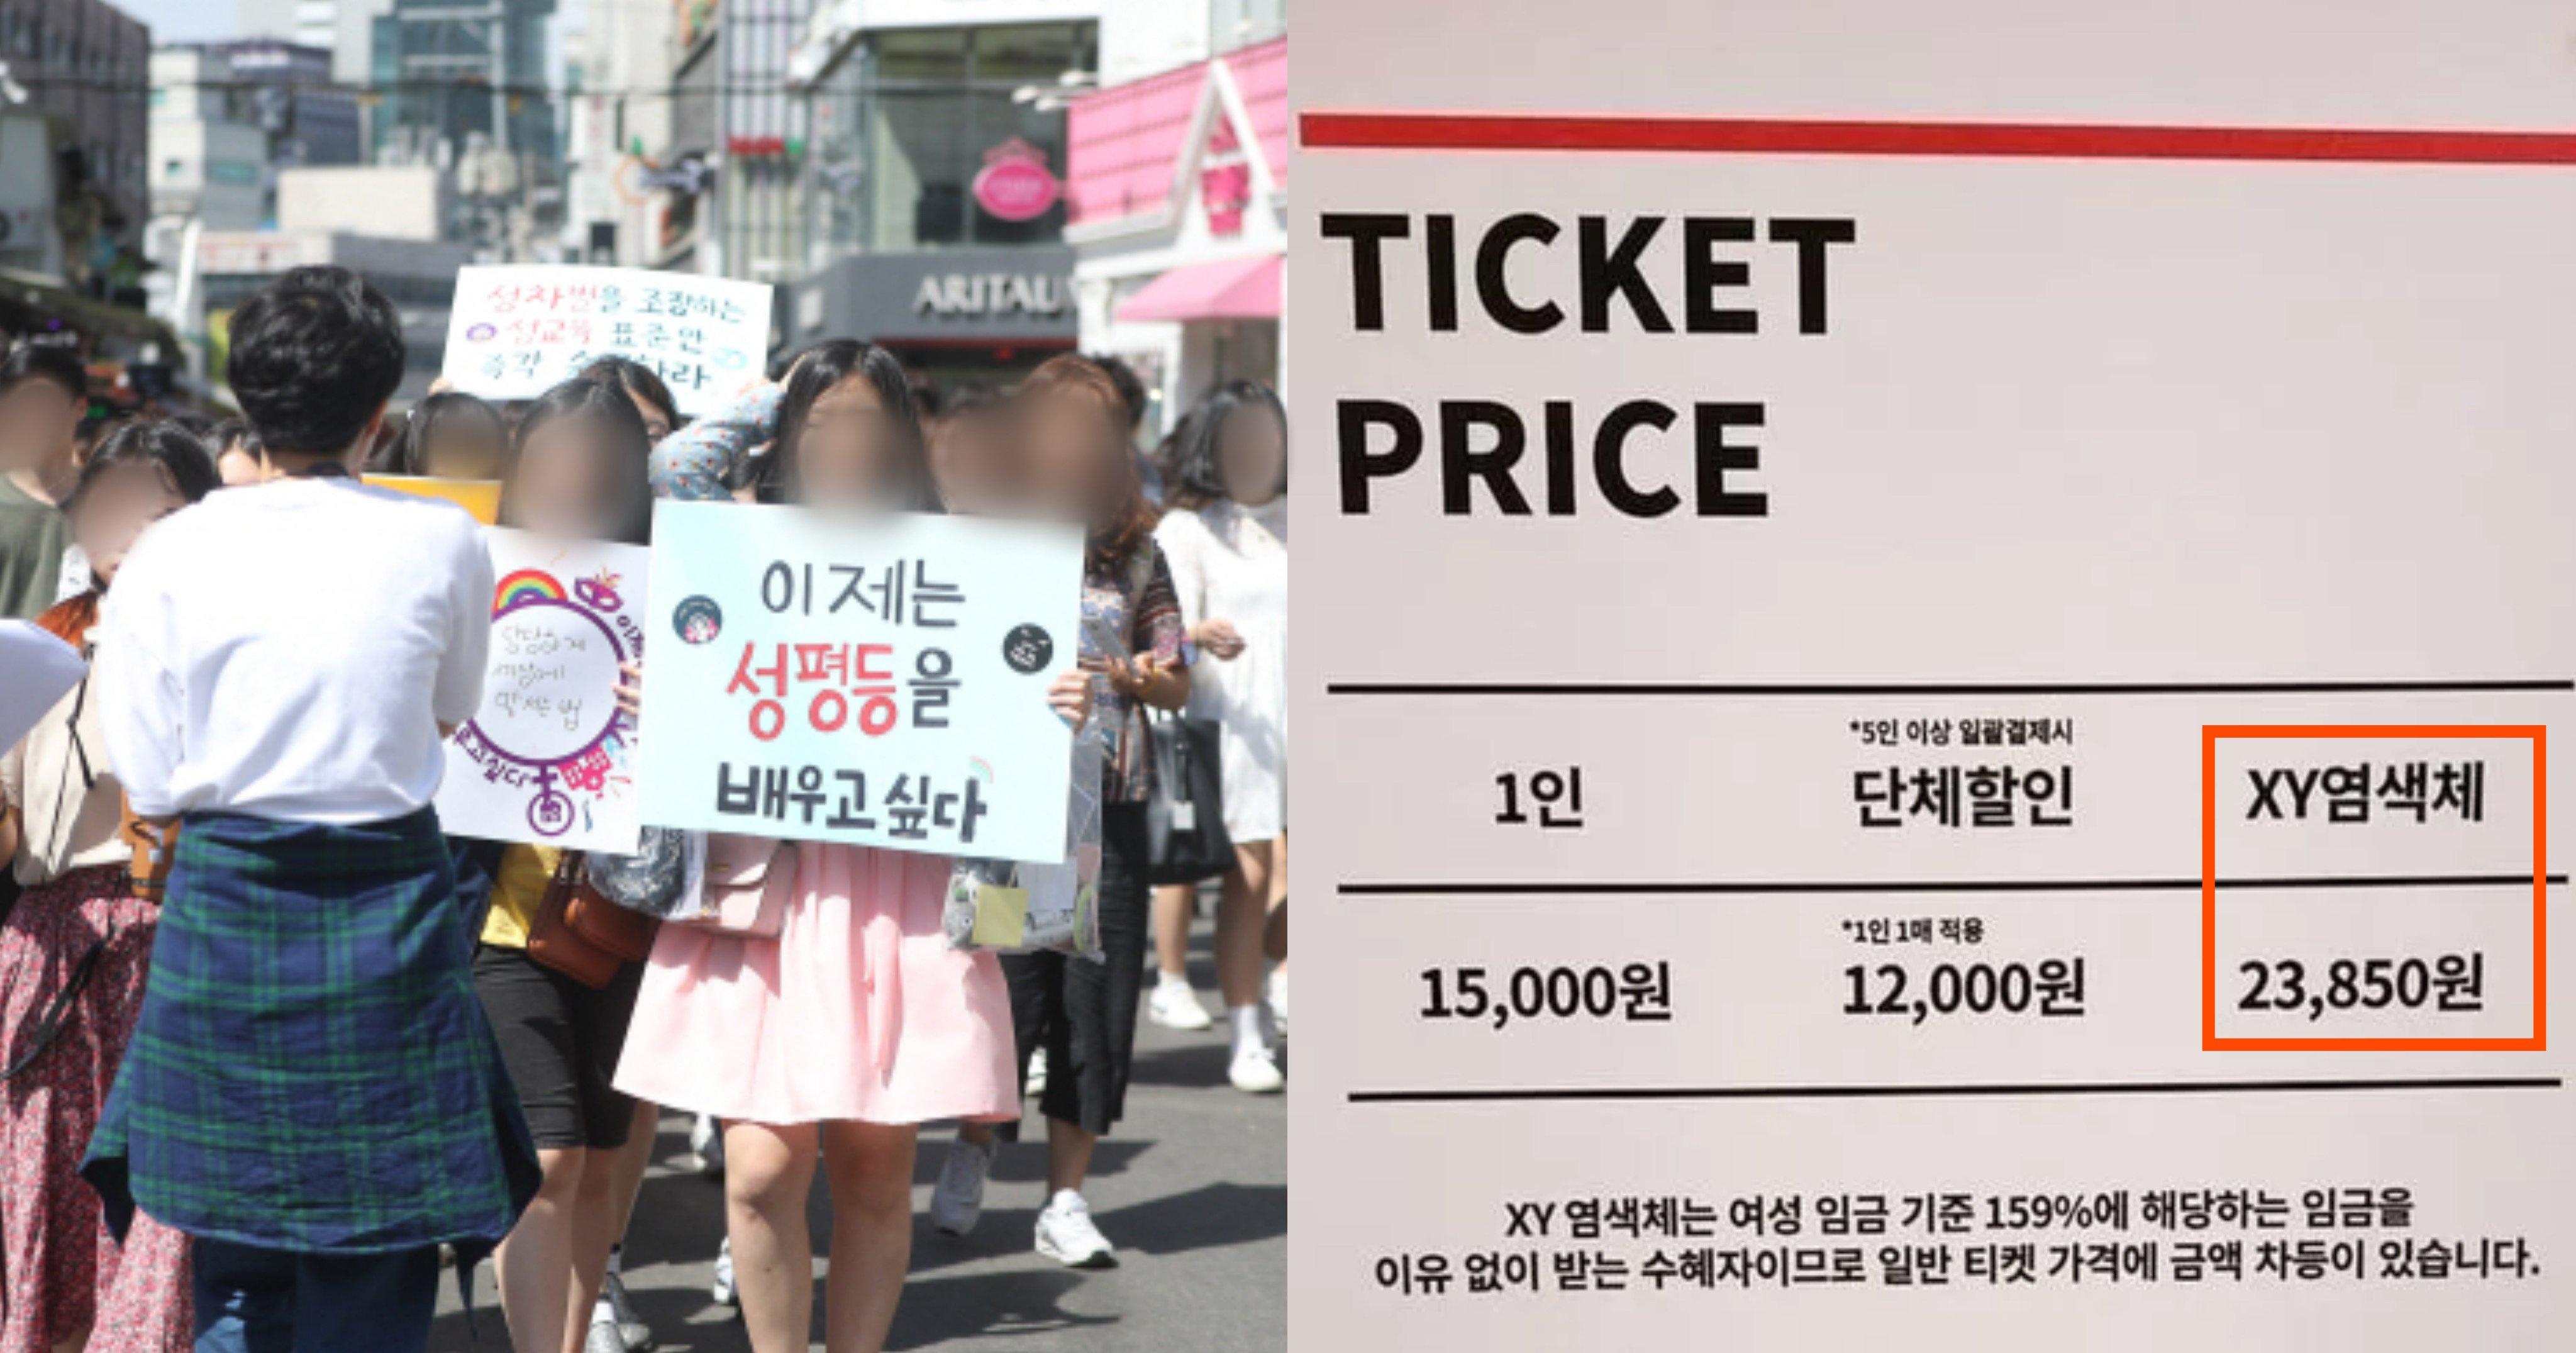 "kakaotalk 20210502 232930608.jpg?resize=1200,630 - ""남자는 여성보다 임금을 많이 받으니 돈 더 받습니다""라는 논란의 전시회(+사진)"